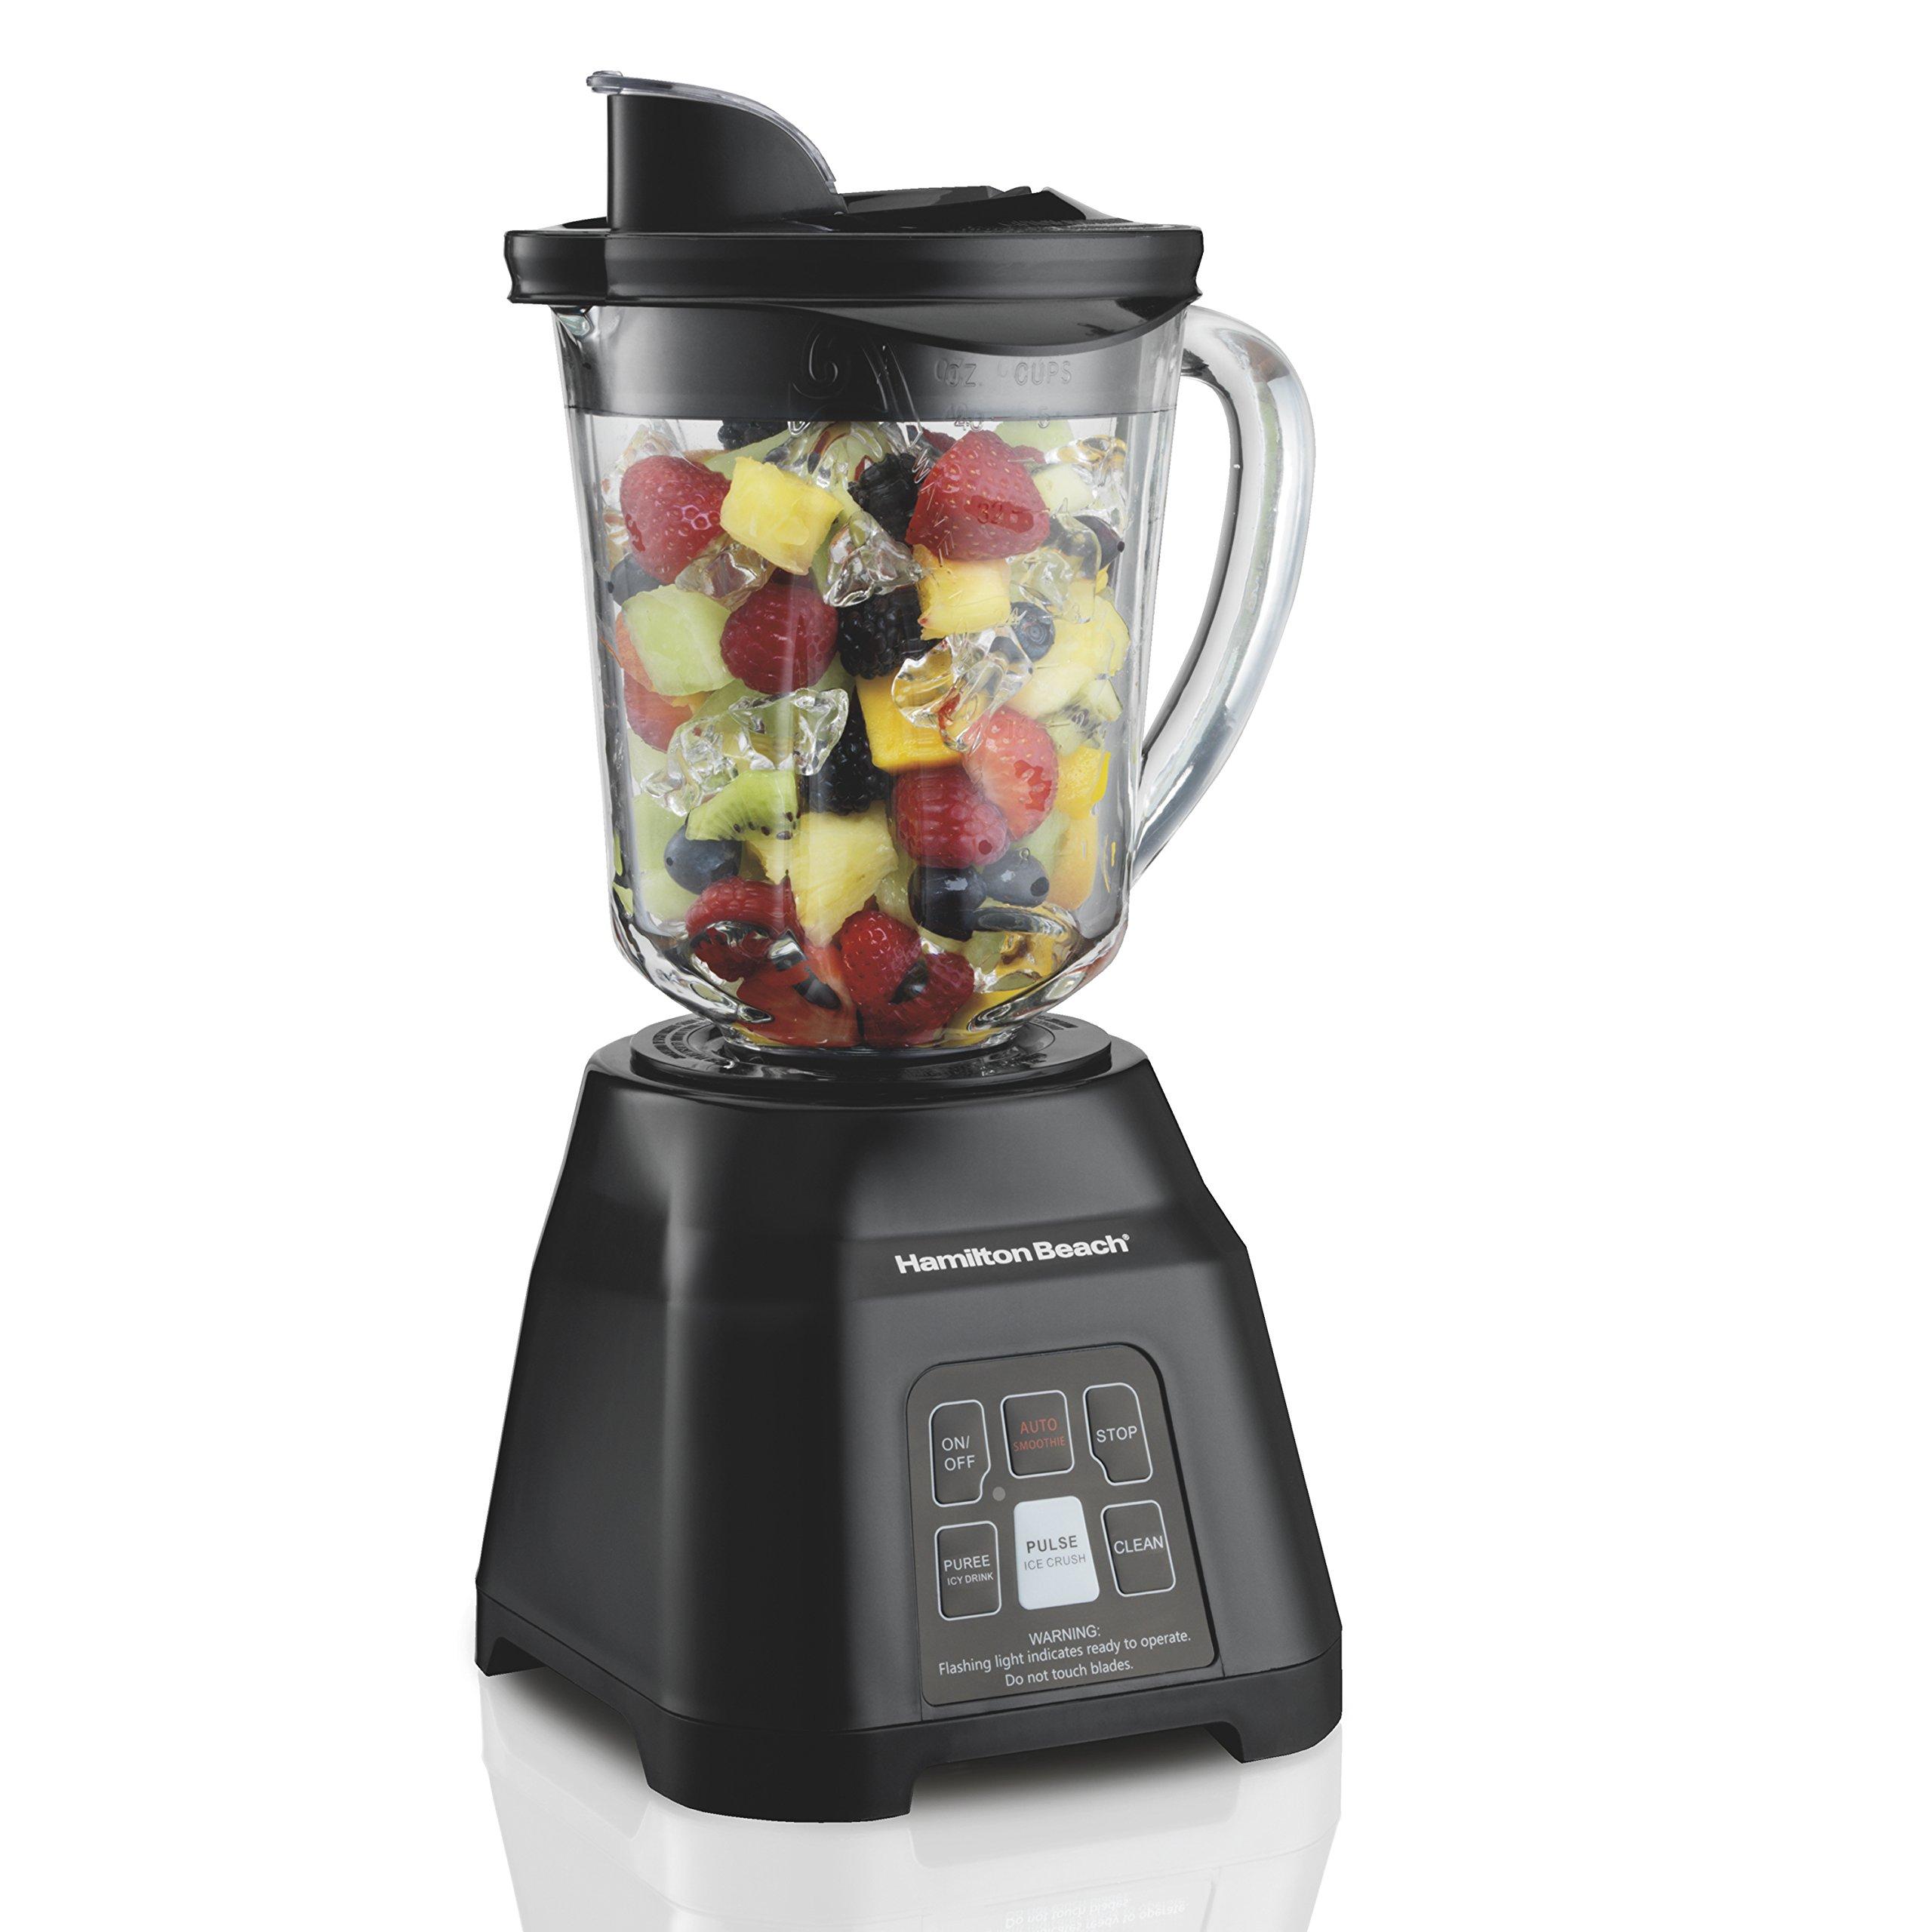 Hamilton Beach Smoothie Smart Blender with 40 oz Glass Jar & 700 Watts (56207)